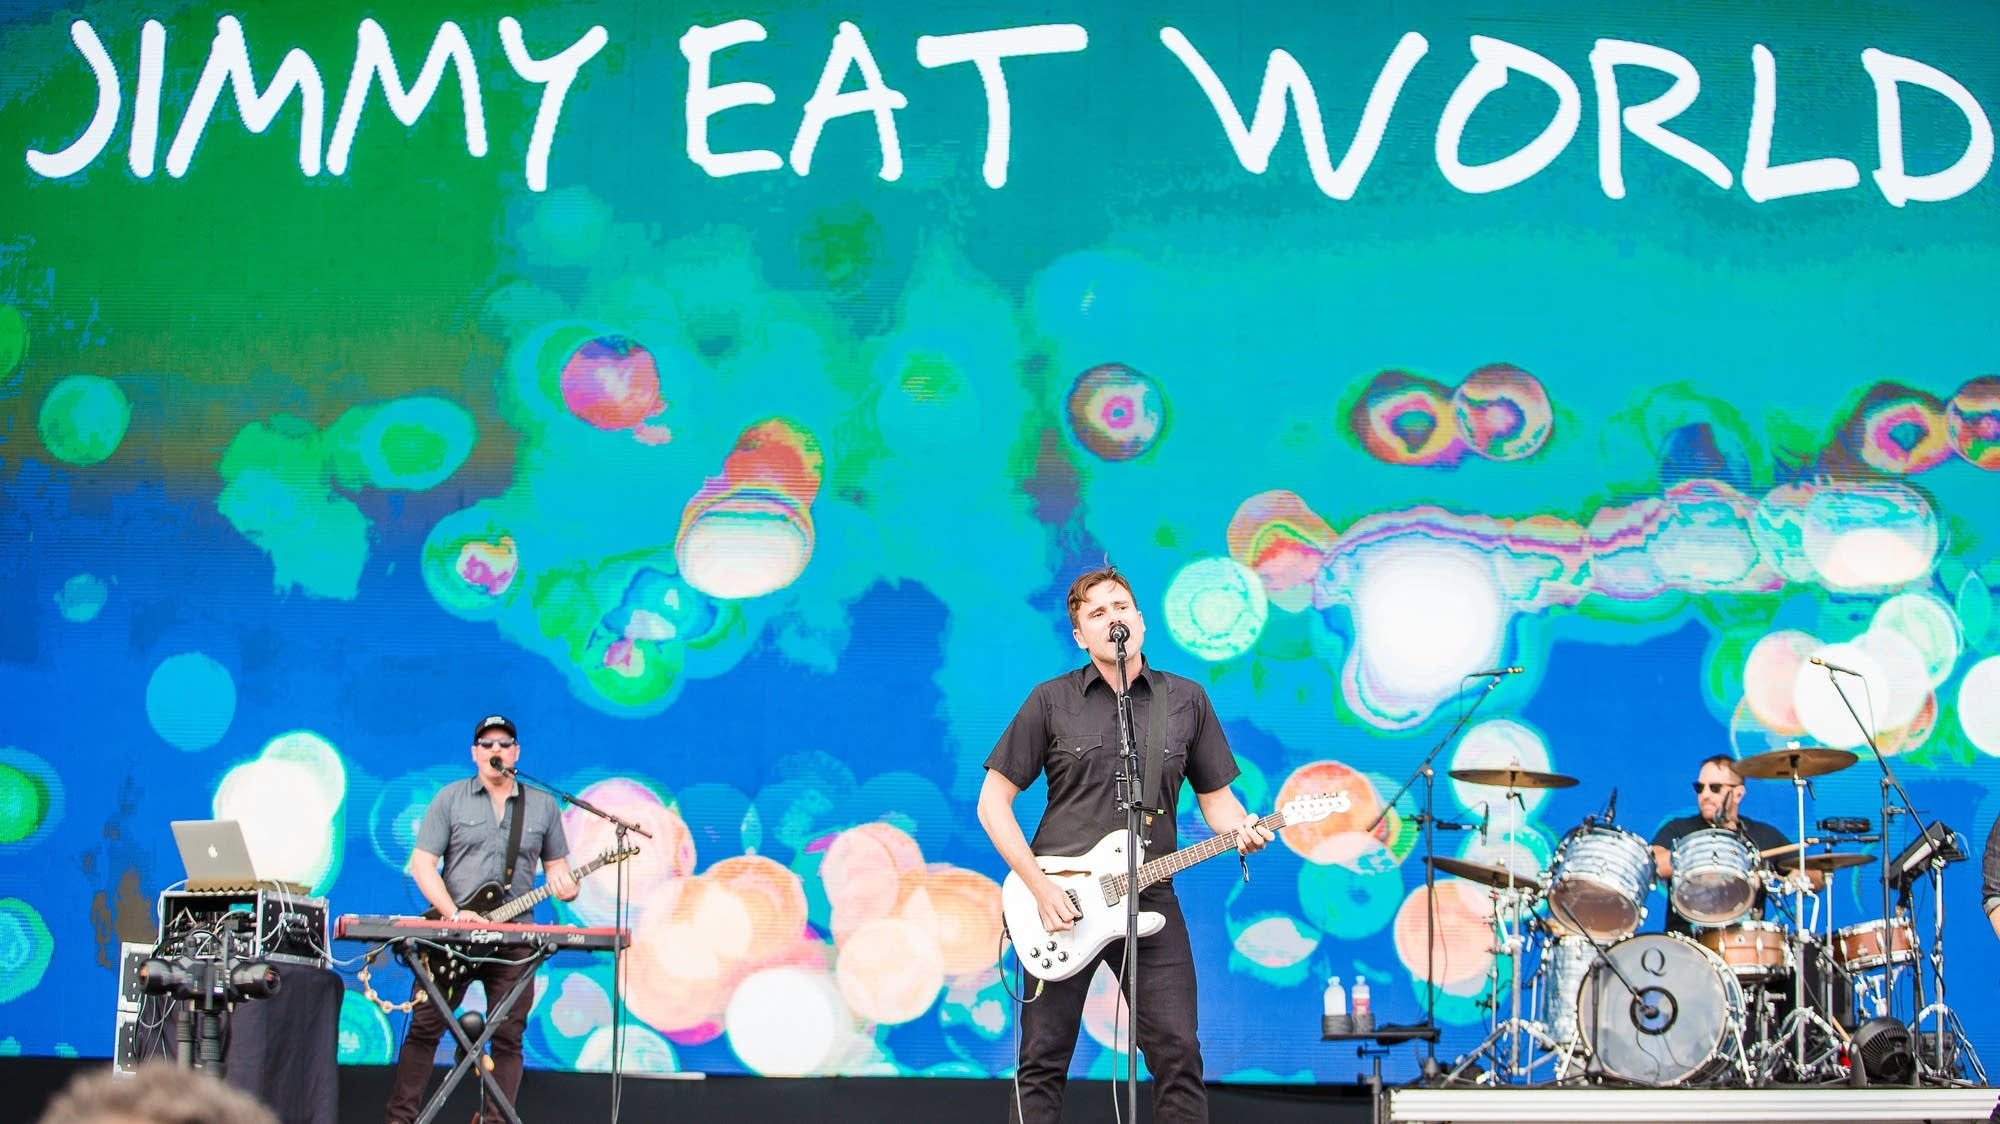 Jimmy Eat World at Lollapalooza 2017